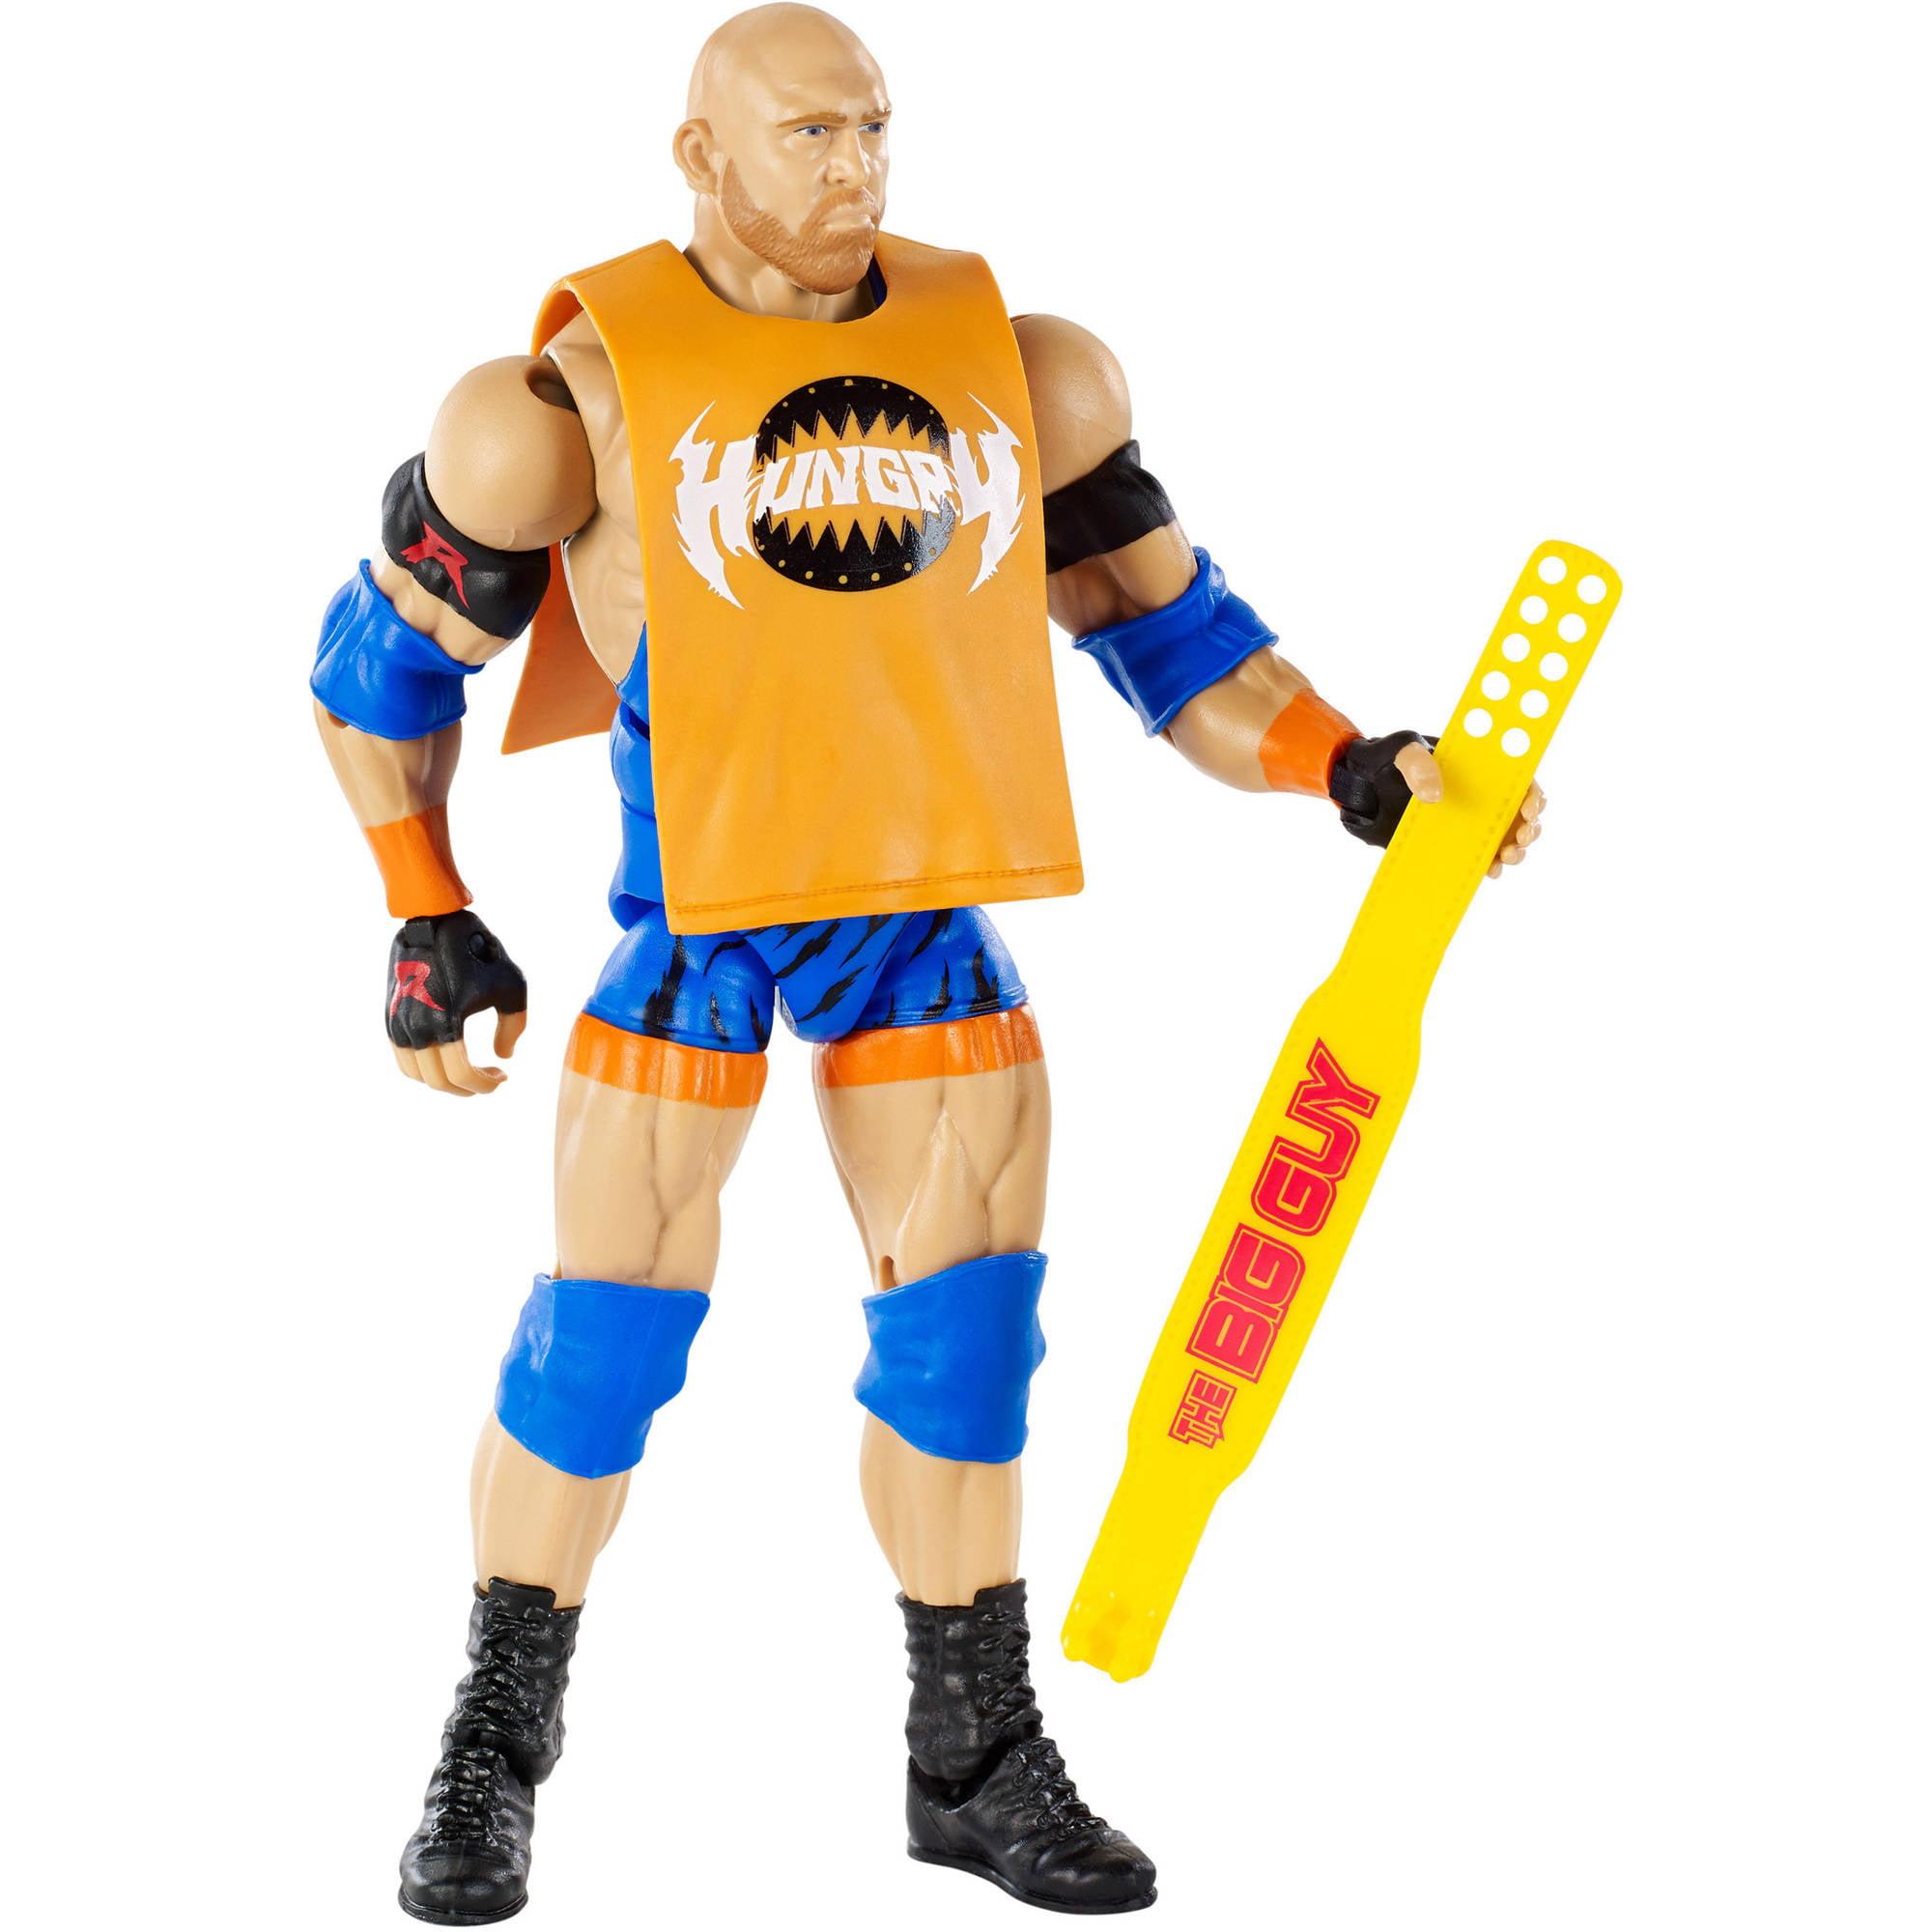 WWE Elite Ryback Action Figure by Mattel